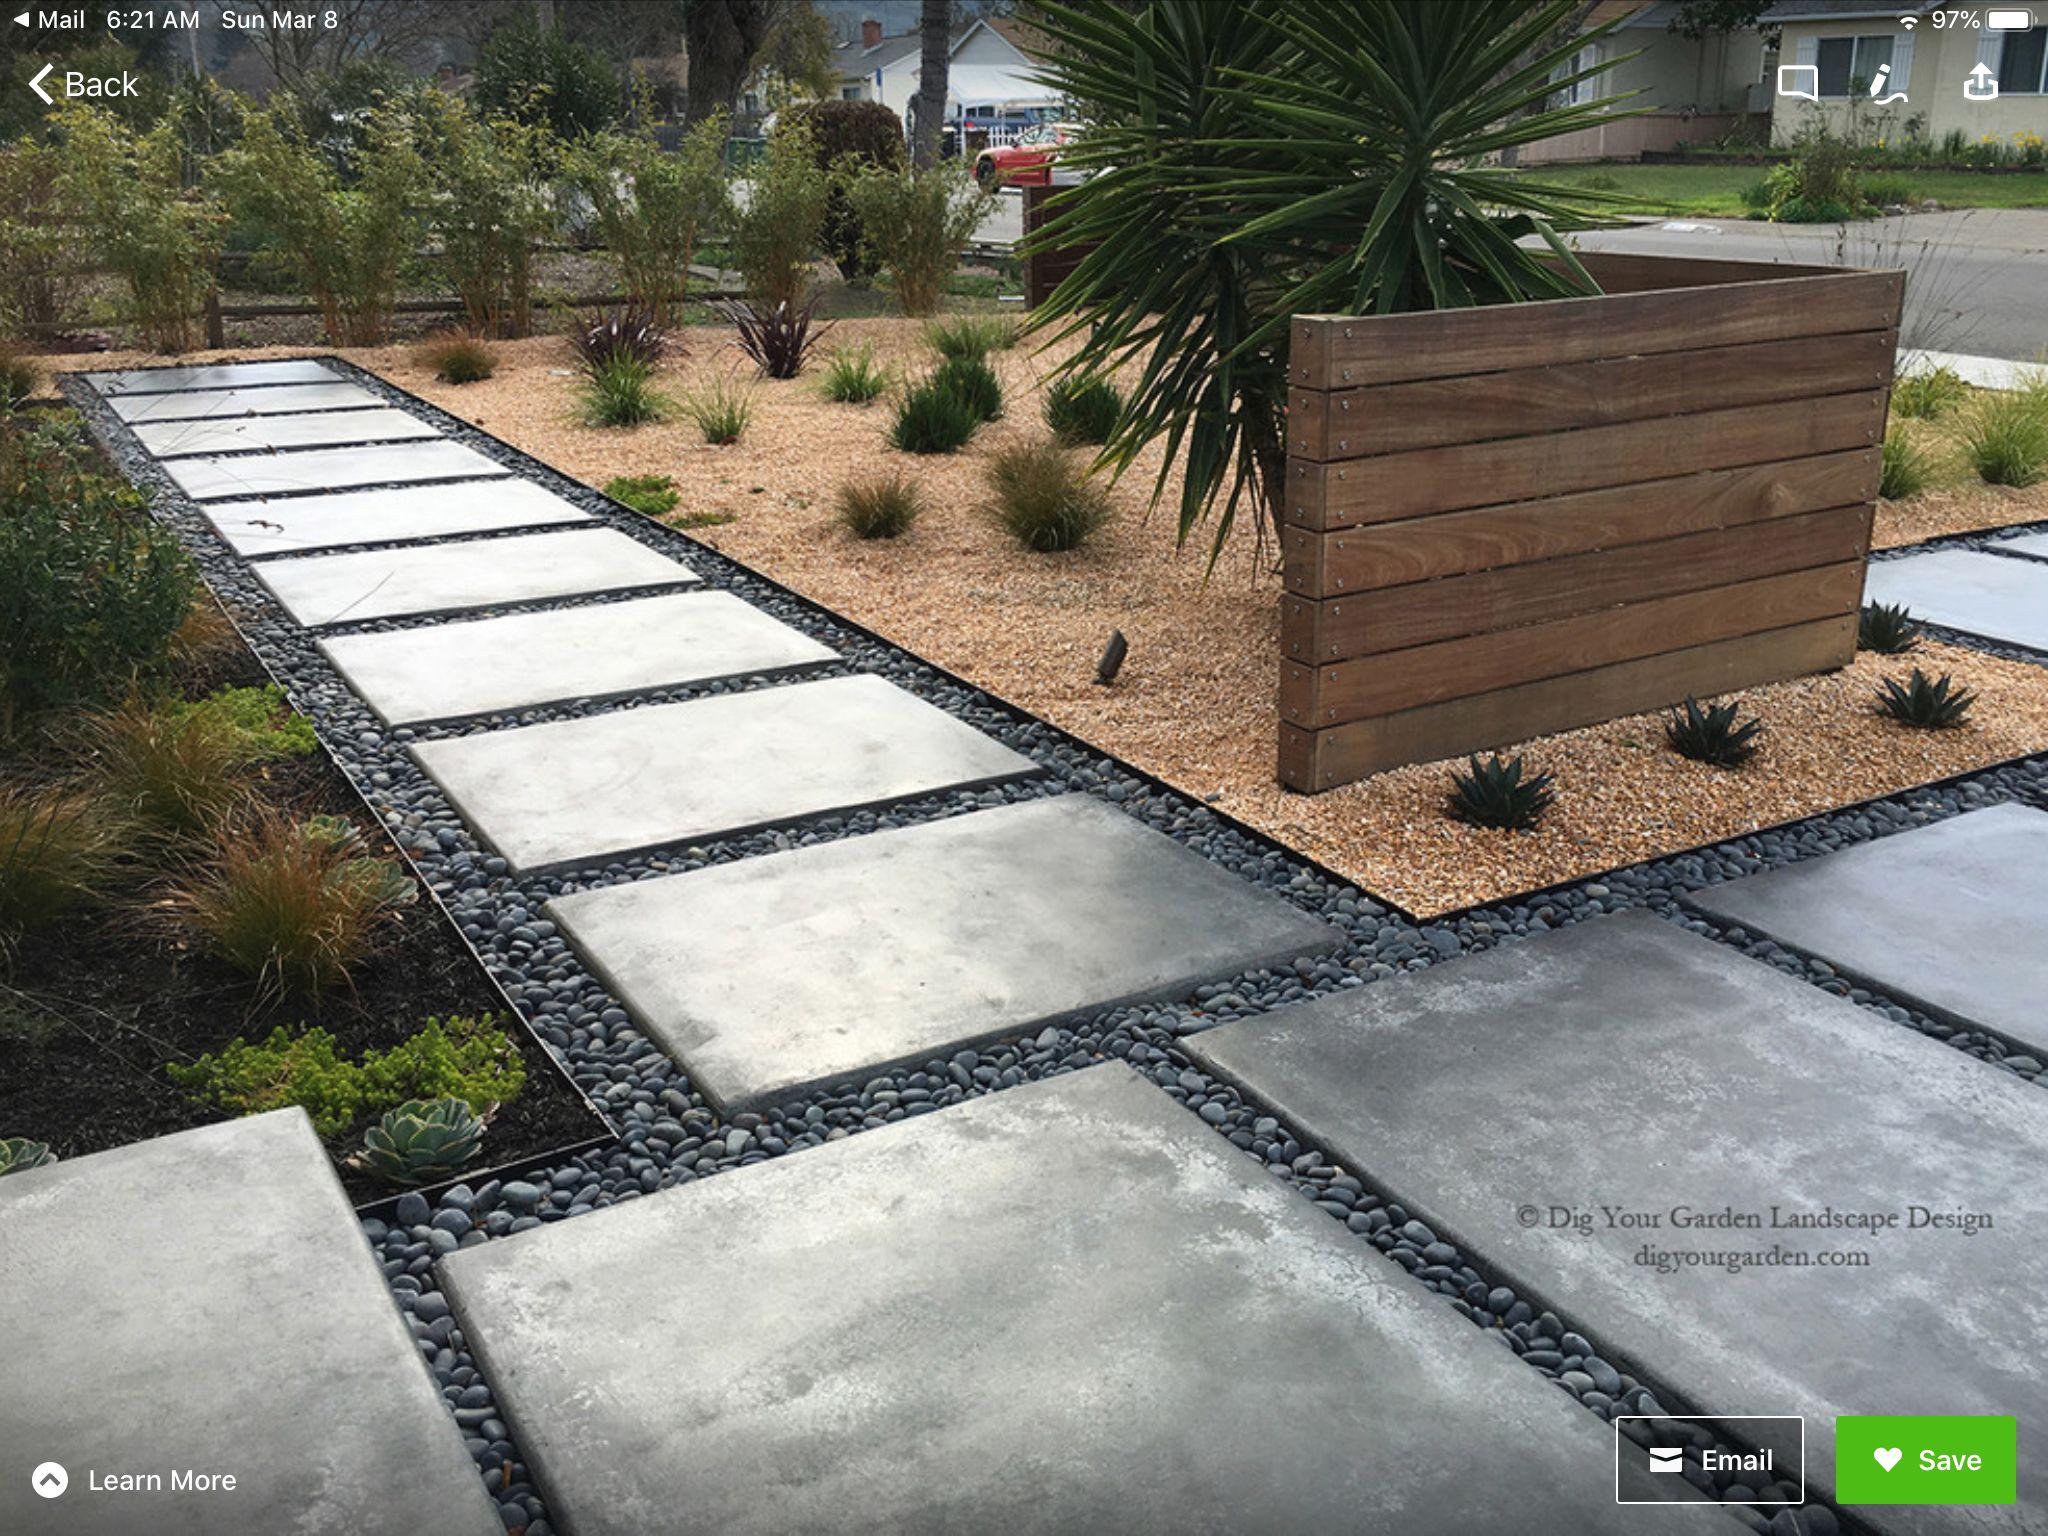 Pin By Philip Johnston On Garden Spaces In 2020 Modern Landscape Design Front Yard Modern Landscaping Modern Landscape Design